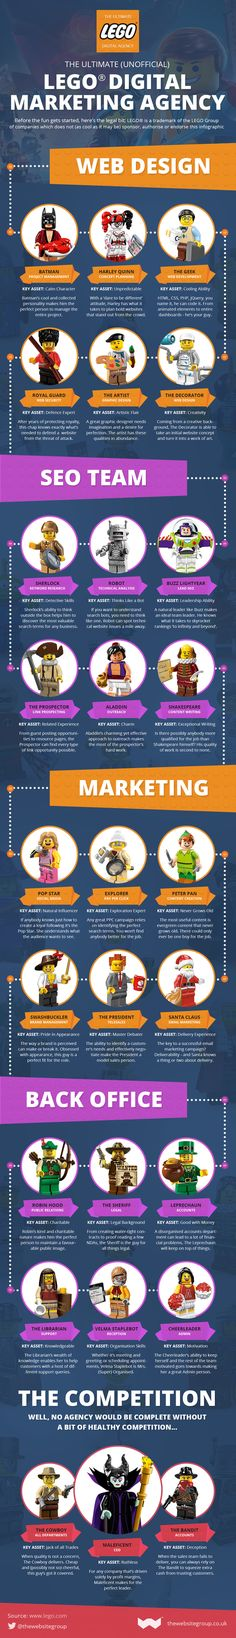 Building Your Marketing Dream Team #socialmedia #socialmarketing #mobile